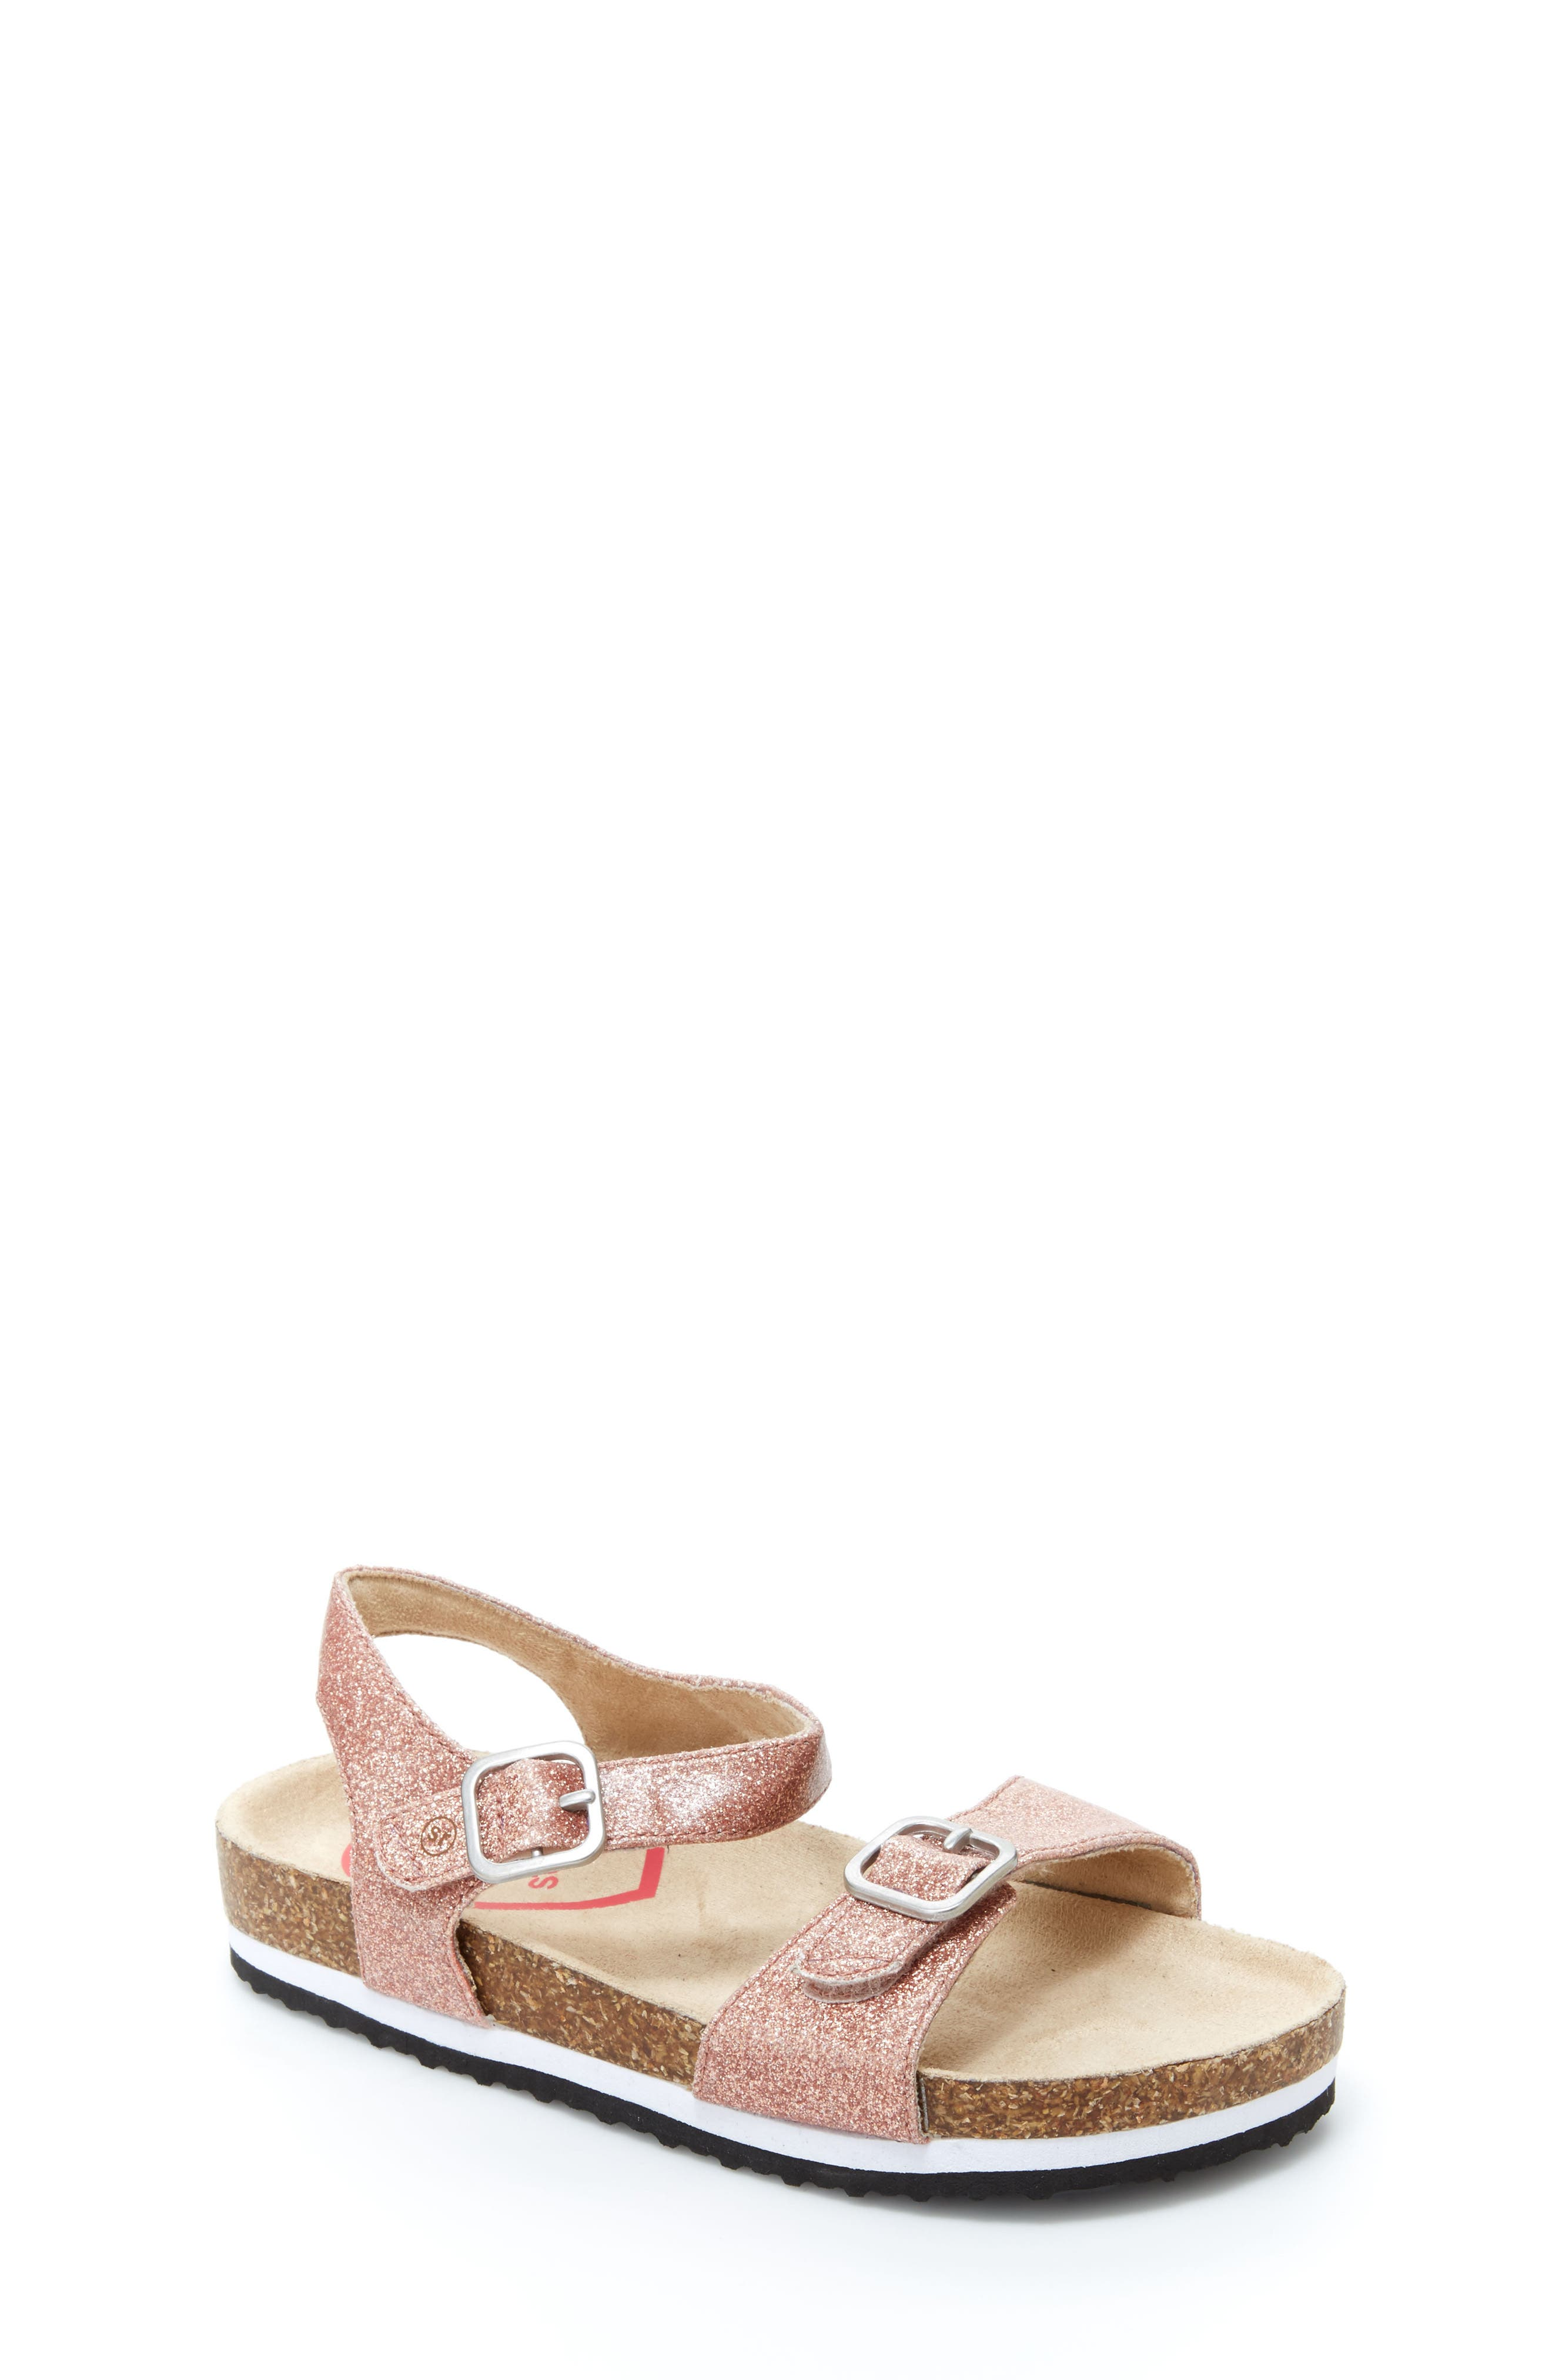 Zuly Glitter Sandal,                             Main thumbnail 1, color,                             ROSE GOLD